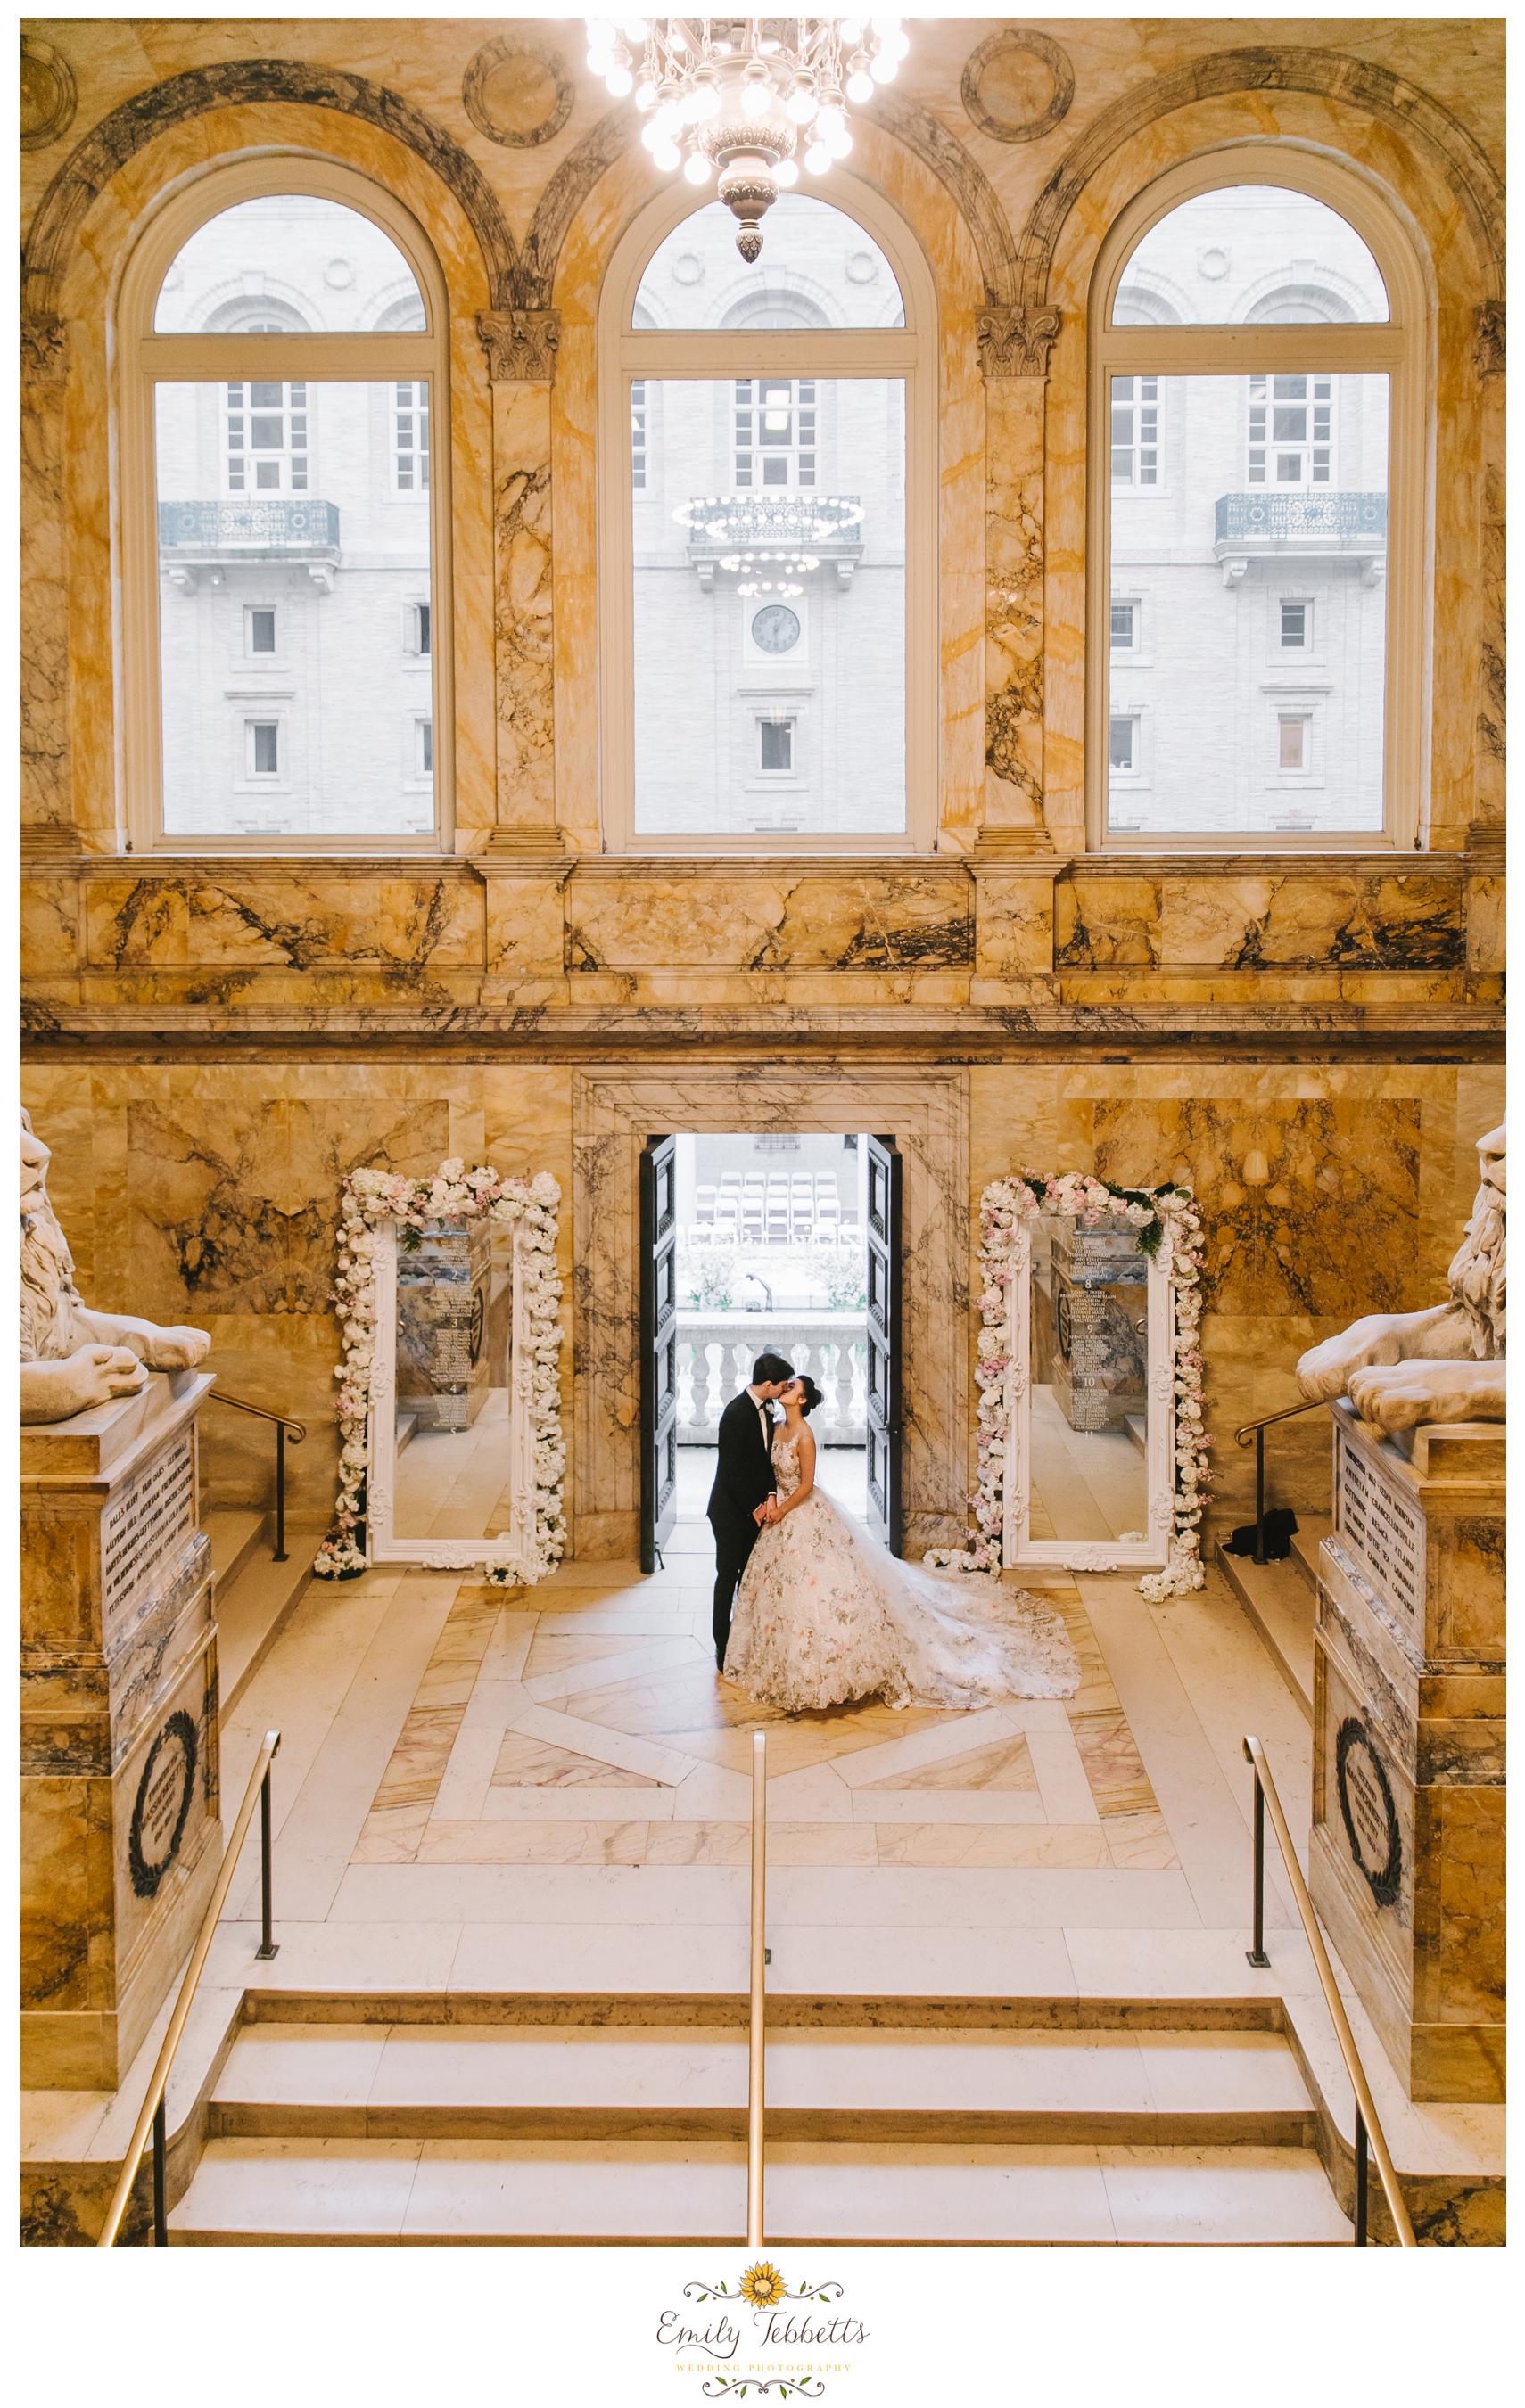 Boston Public Library BPL Wedding Emily Tebbetts Photography - Kaori + John-4.jpg